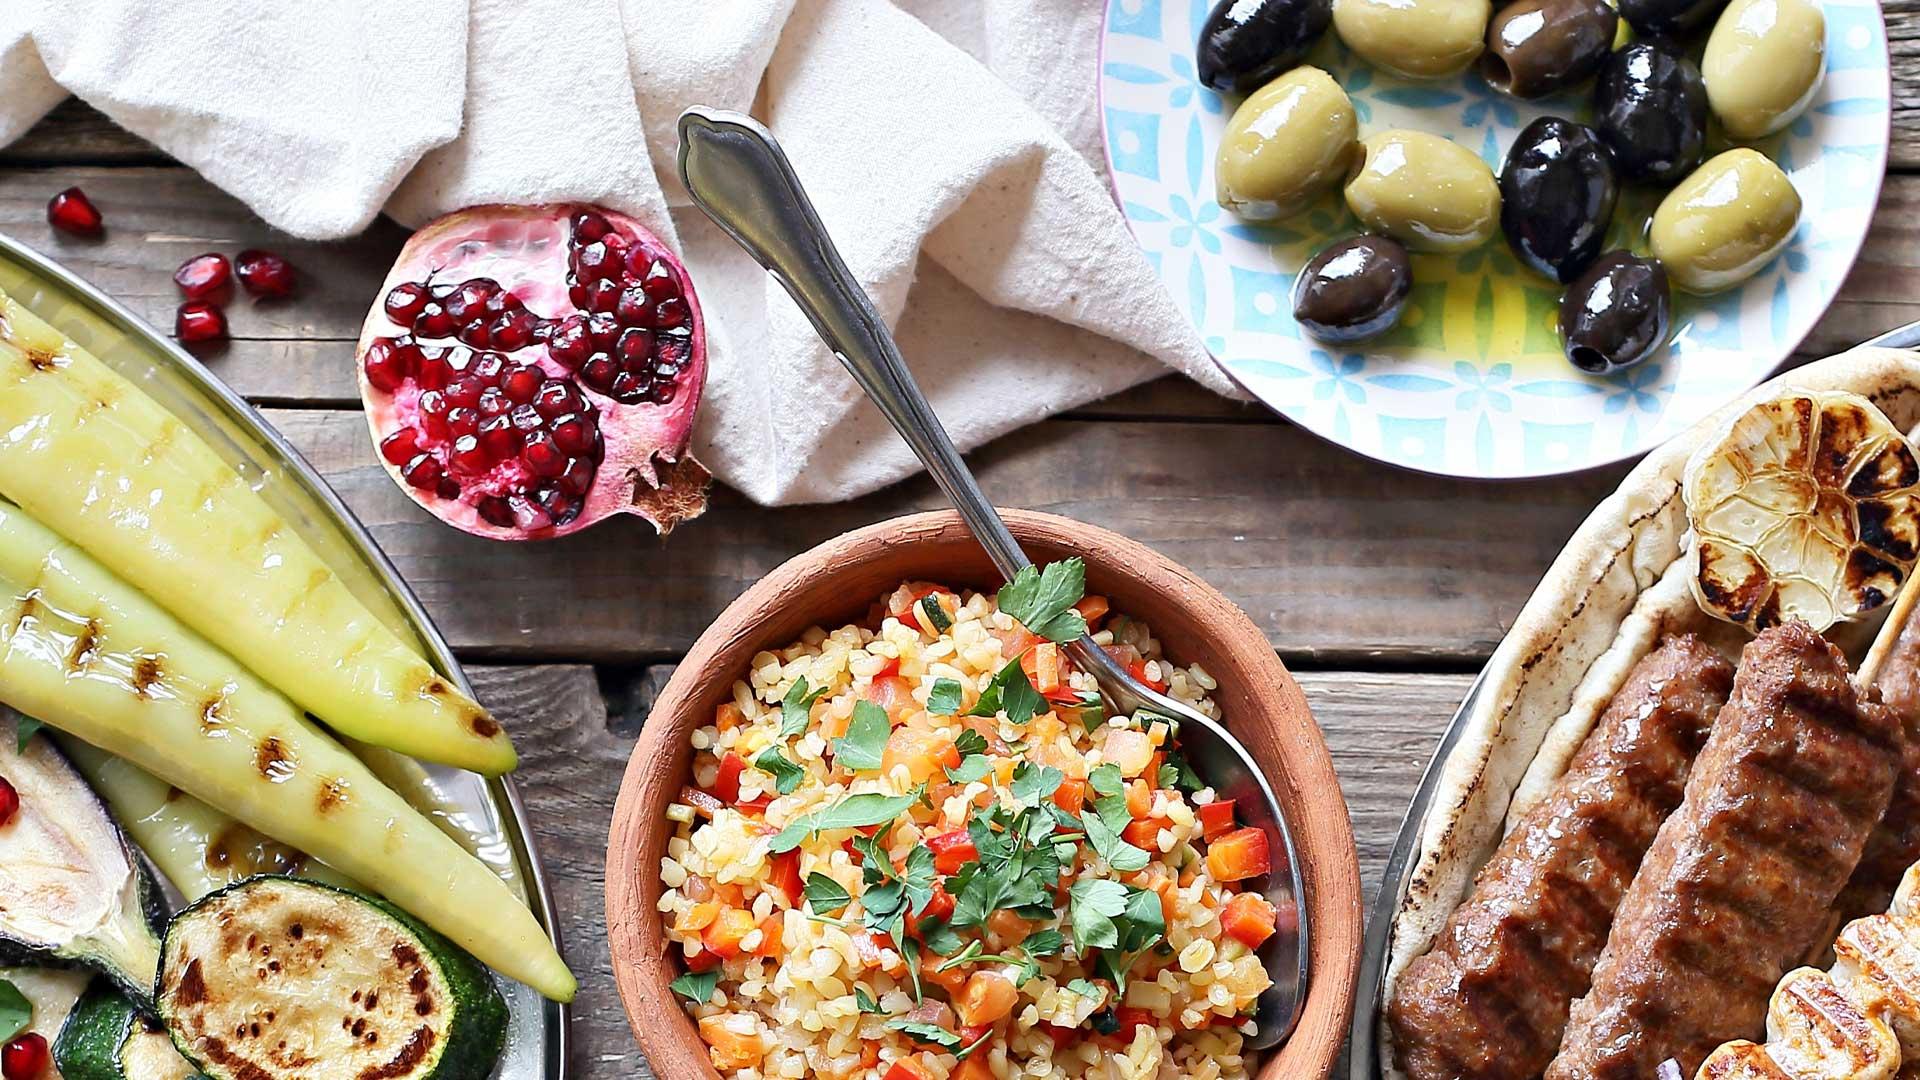 A table of Mediterranean food including grain salad, olives, pomegranate, and grilled vegetables.